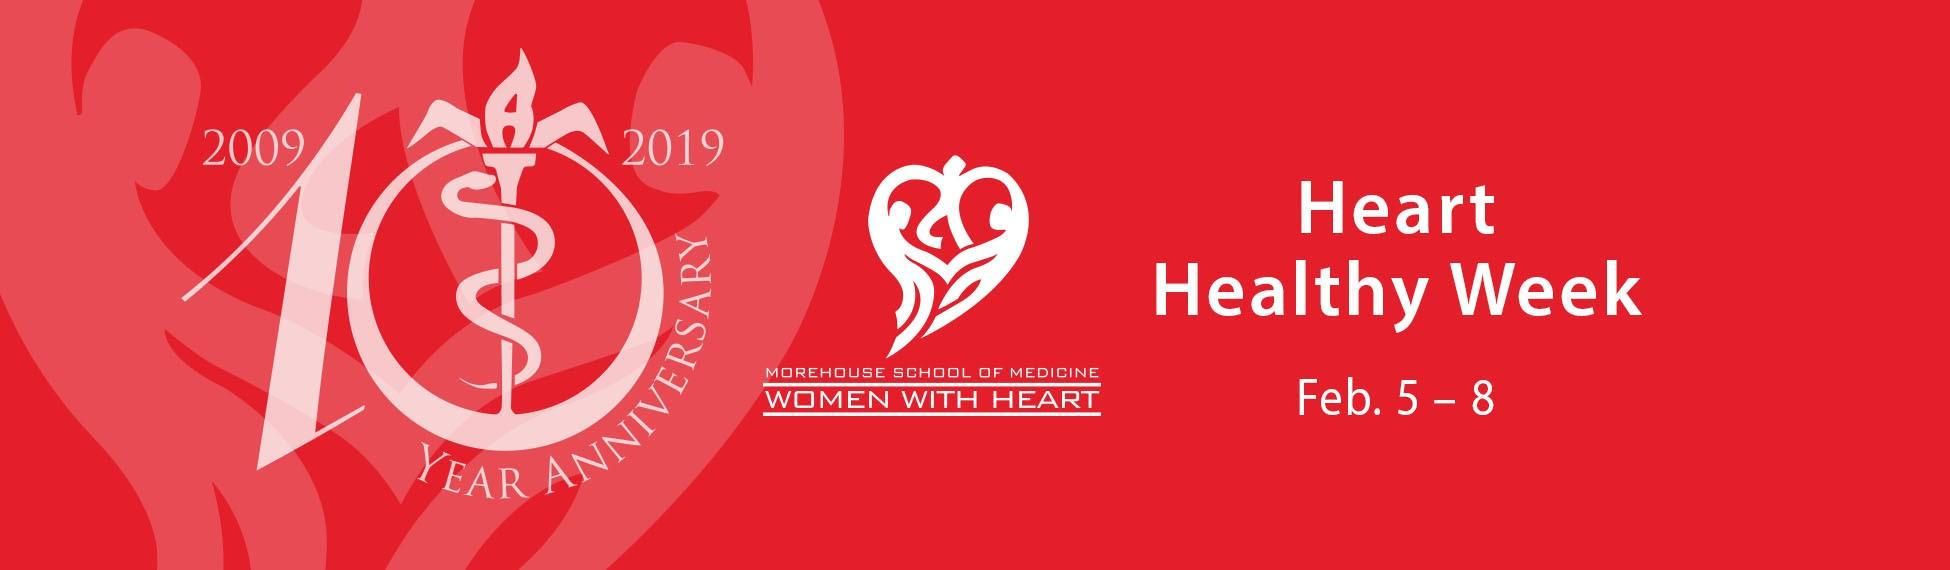 Heart Healthy Week Feb. 5-8